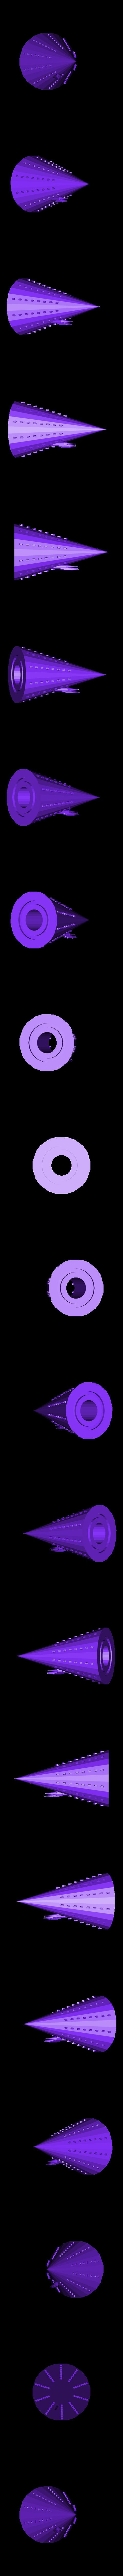 Spiral Cap.stl Download free STL file Hogwarts School of Witchcraft • 3D printer template, Valient